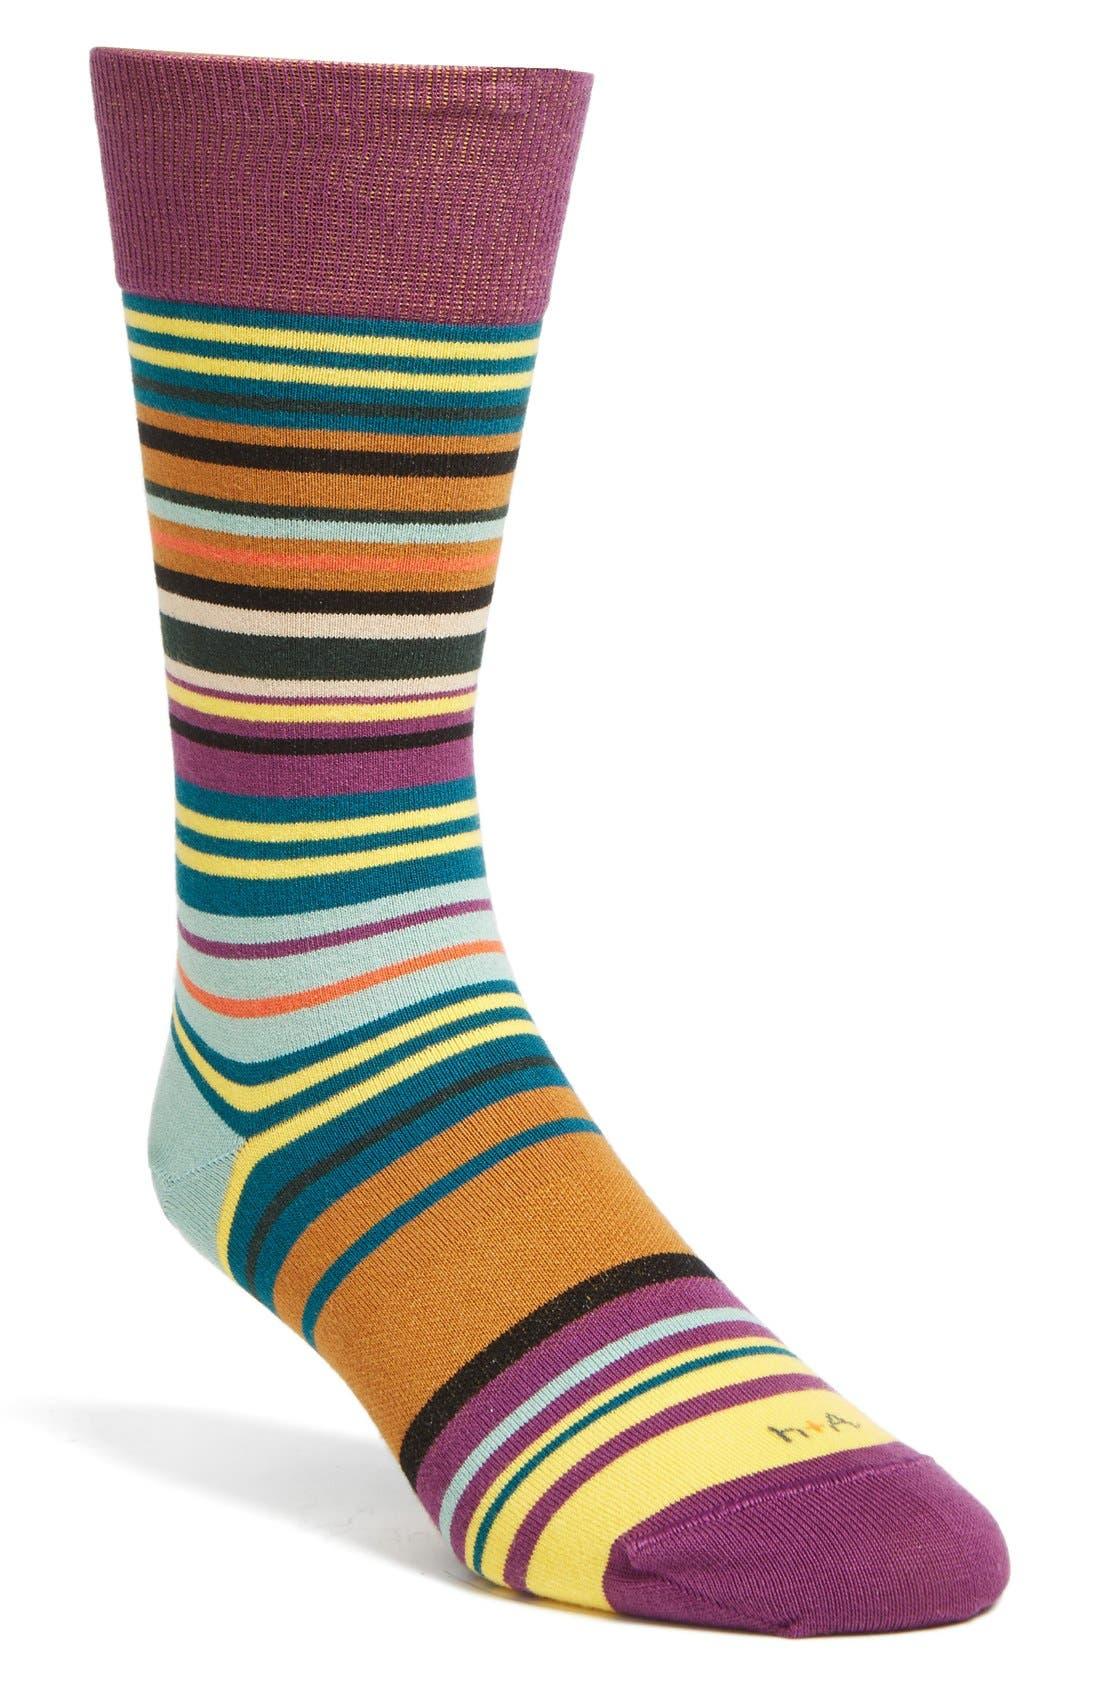 Main Image - hook + ALBERT 'Heat Wave' Socks